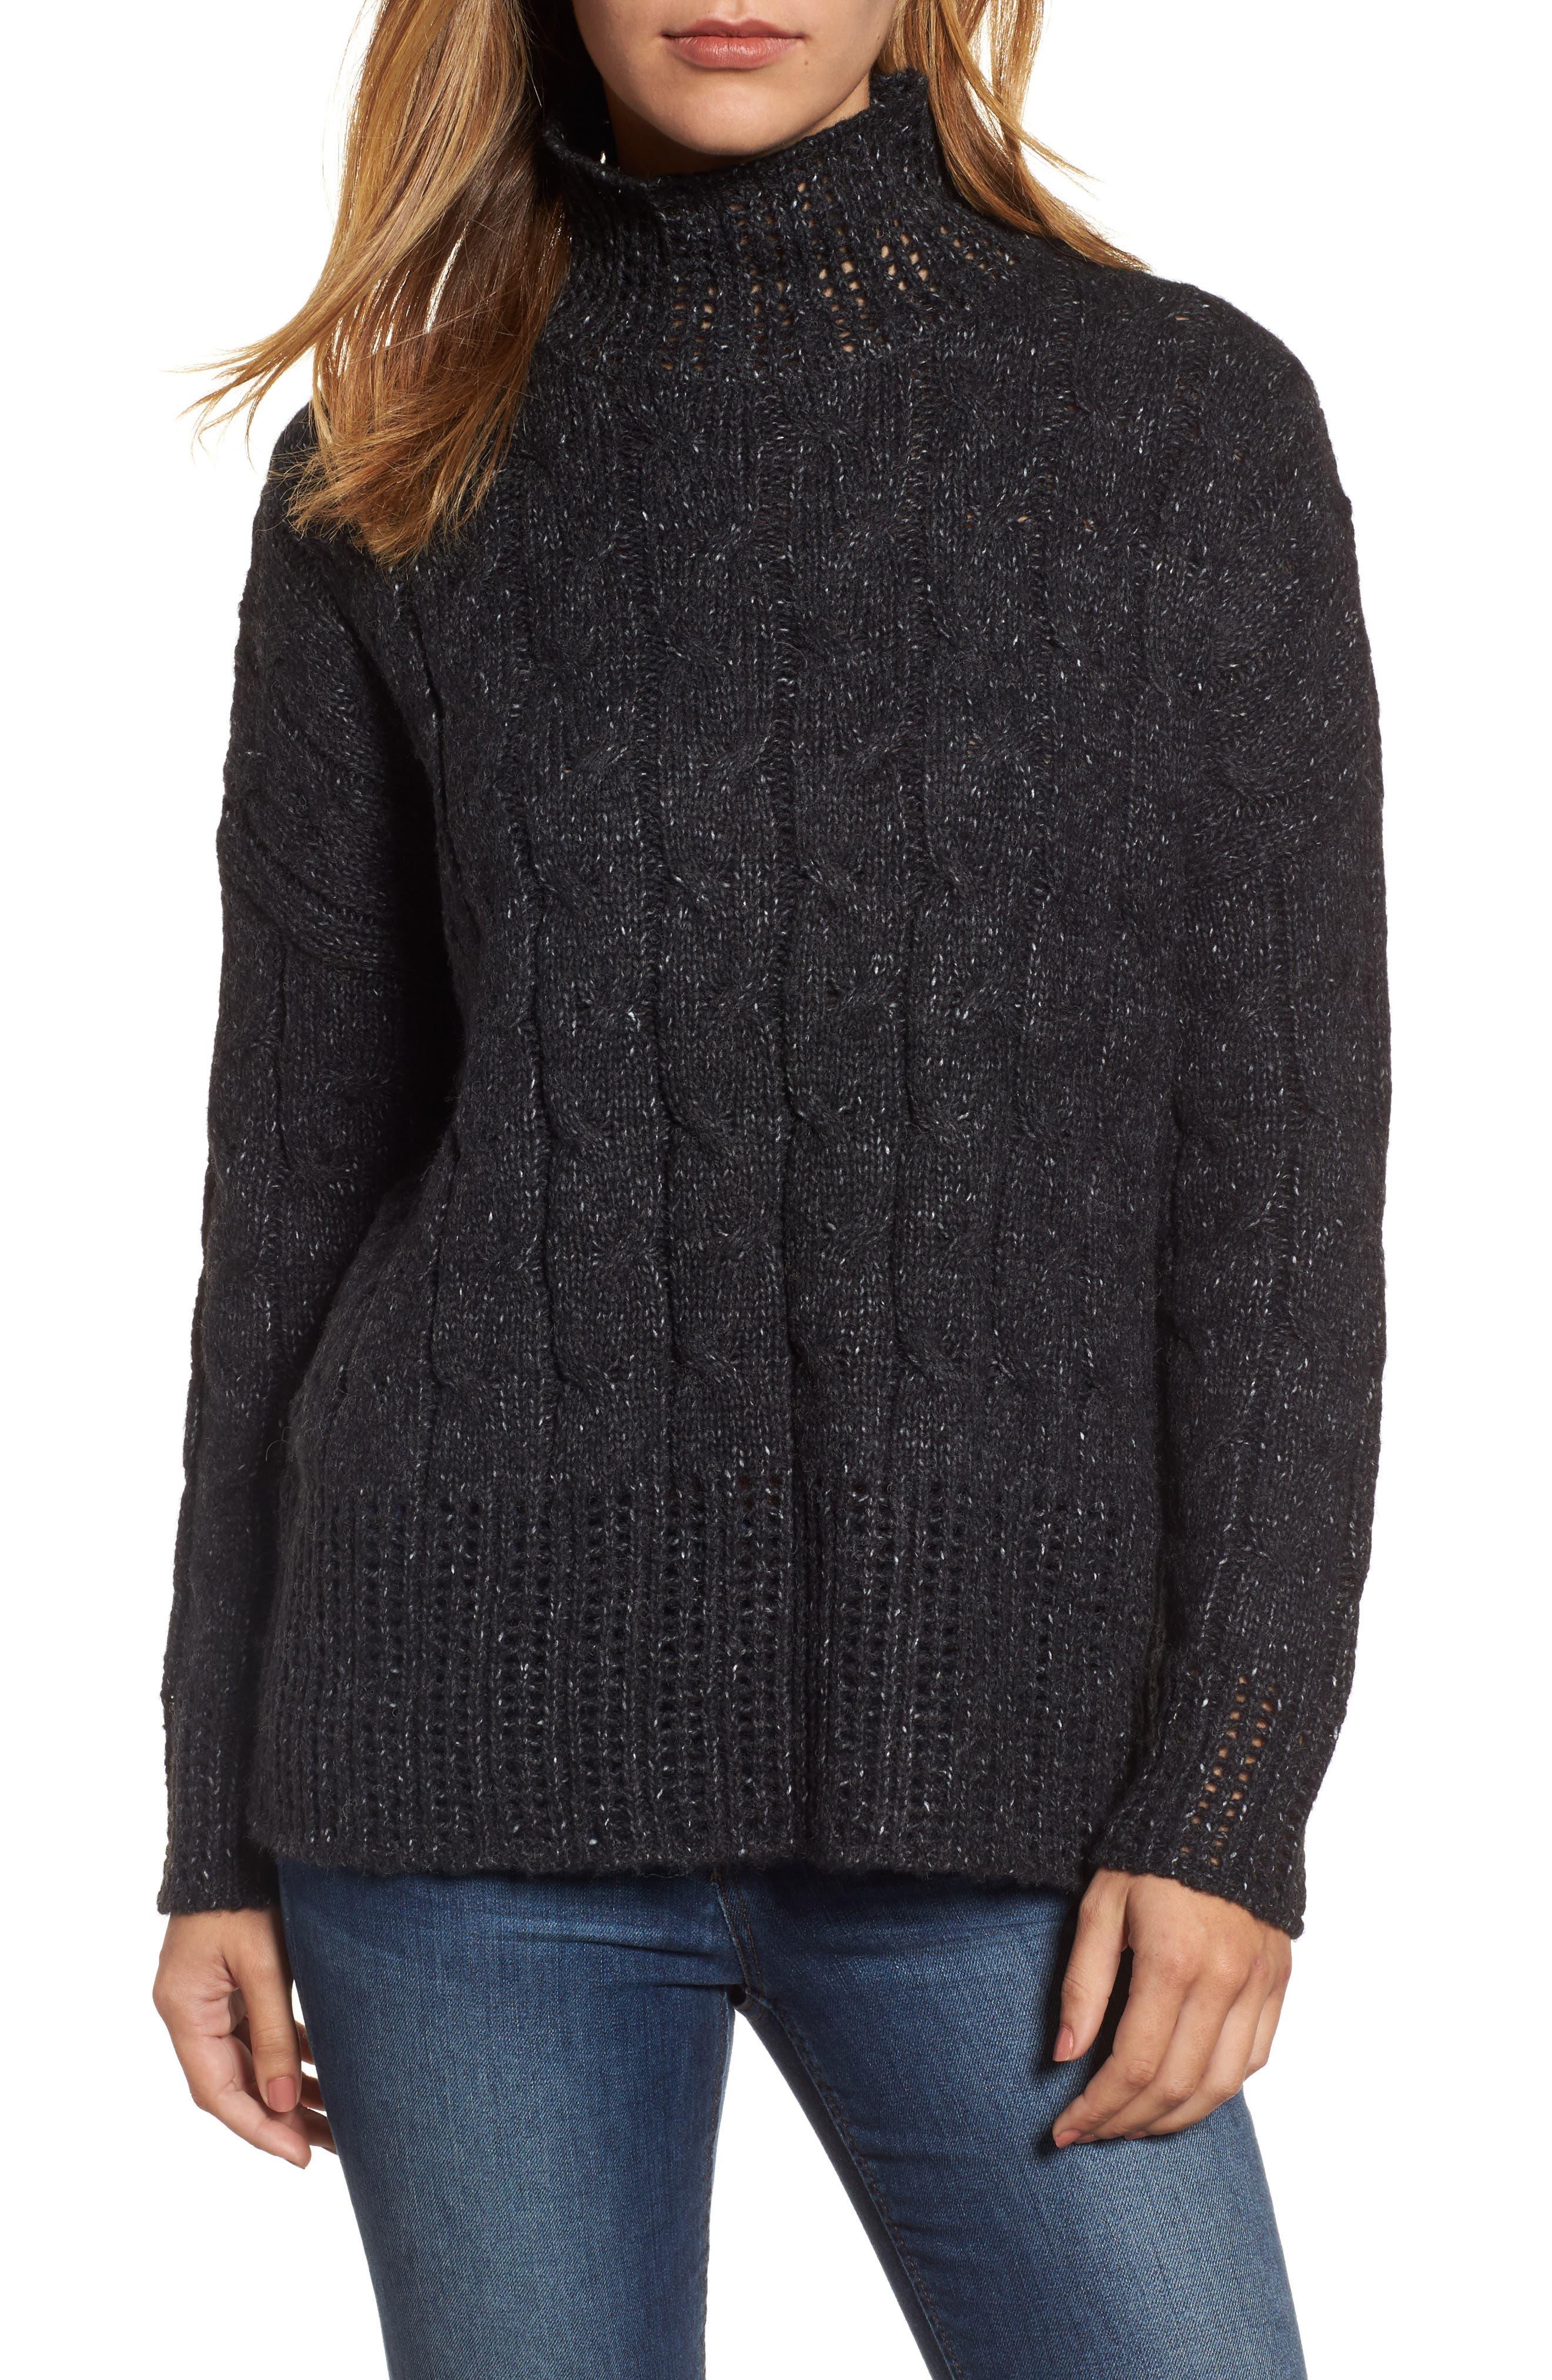 Pointelle Turtleneck Sweater,                             Main thumbnail 1, color,                             001